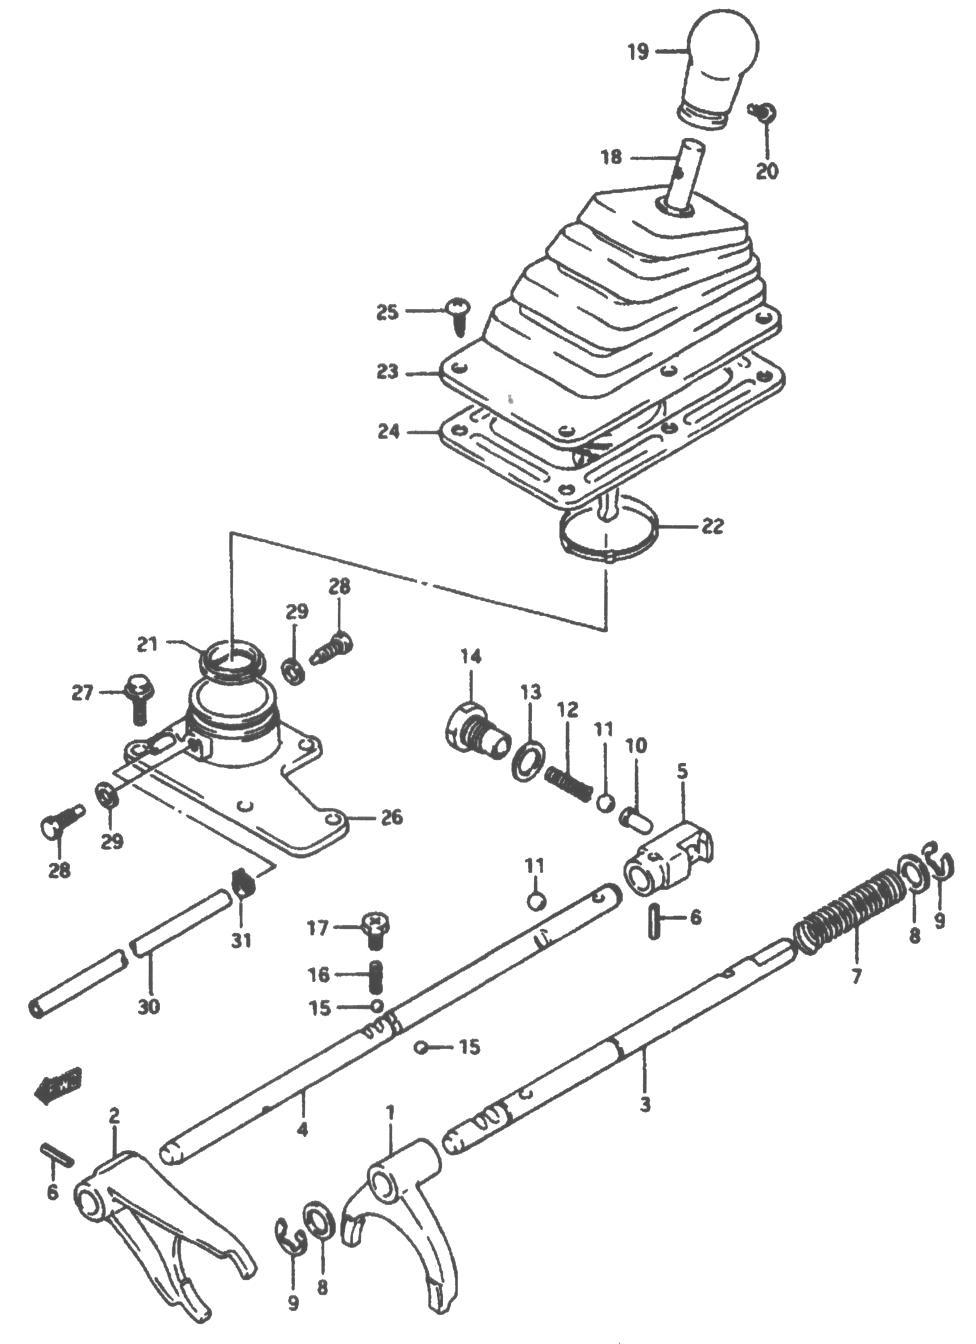 Service manual [1992 Geo Tracker Transfer Case Repair